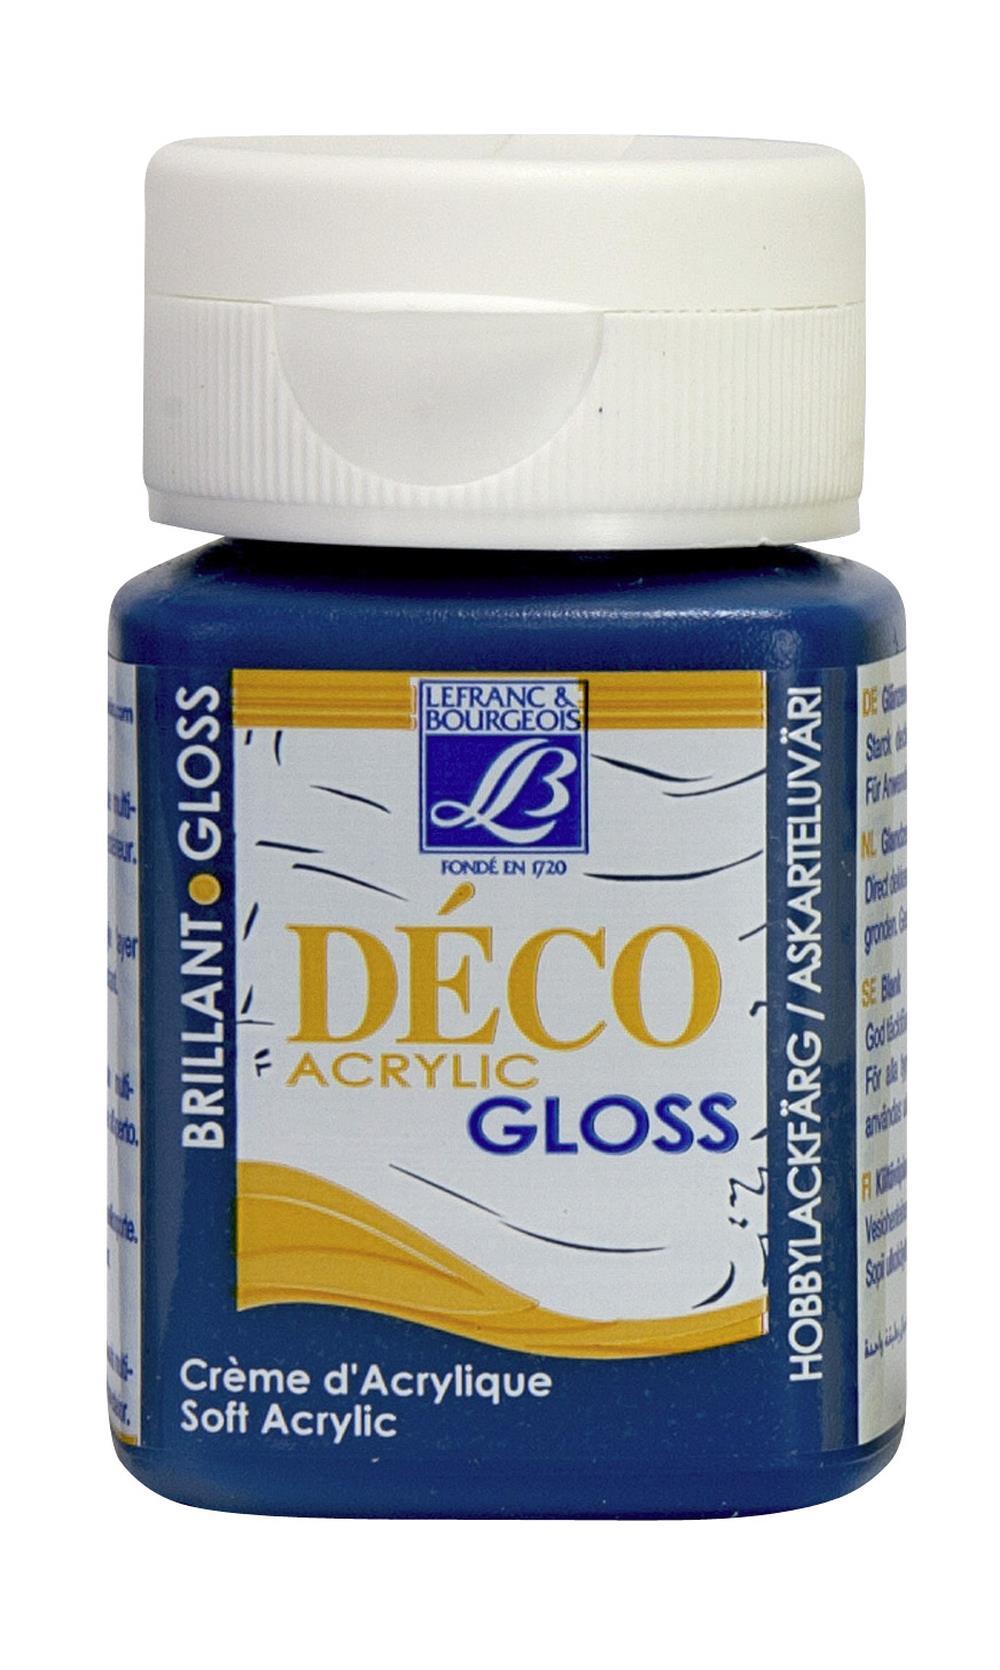 Hobbyfärg L&B Deco Gloss Akryl 50ml  Sapphire 048 (4F) Utgår